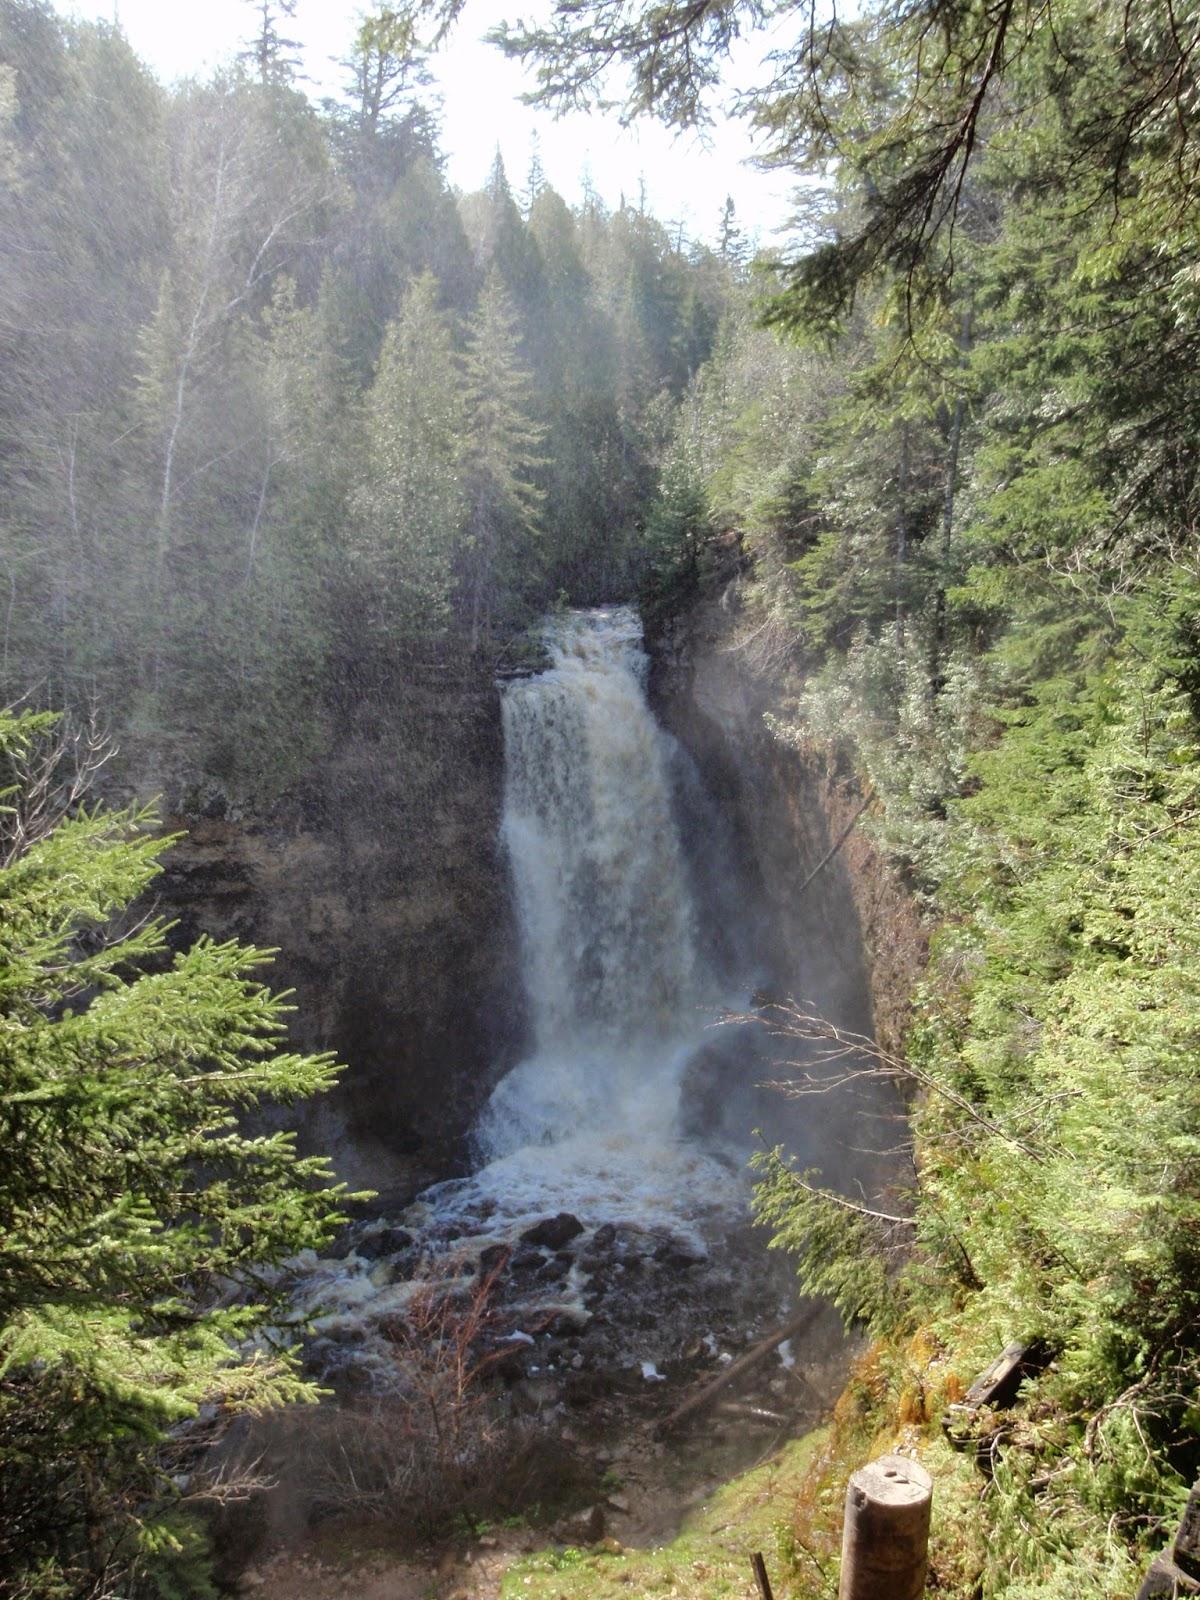 Miners Falls, Pictured Rocks National Lakeshore, Michigan Waterfalls